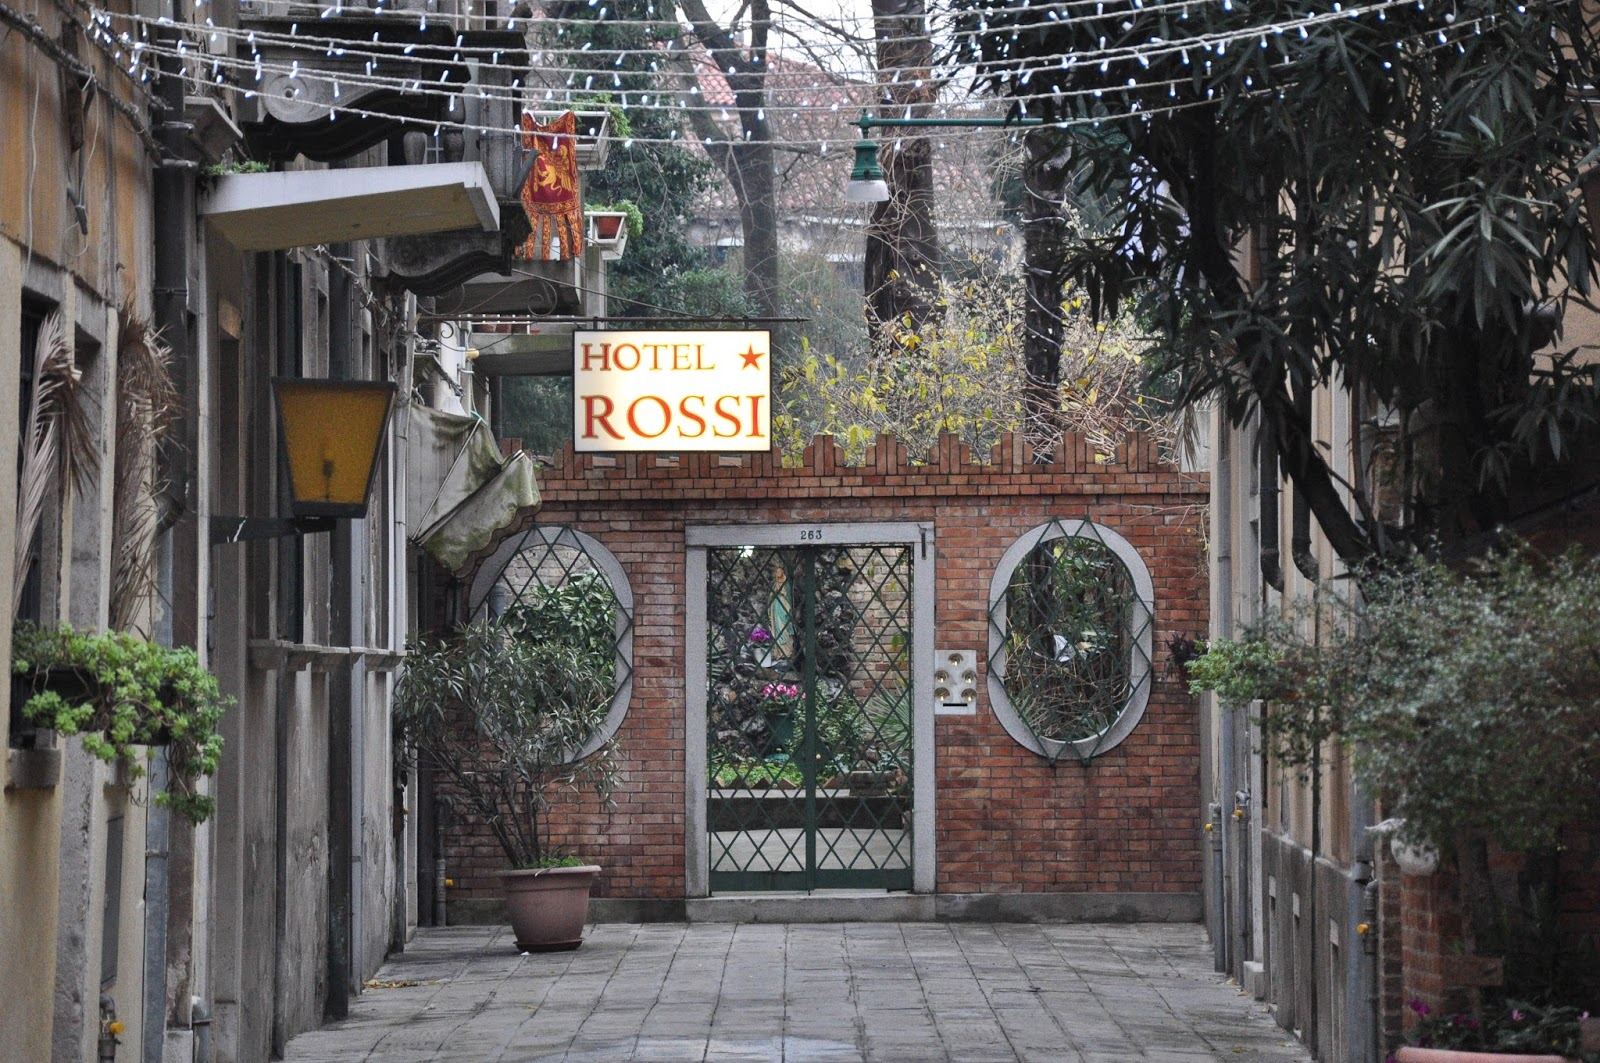 Hotel Rossi, Venice, Italy